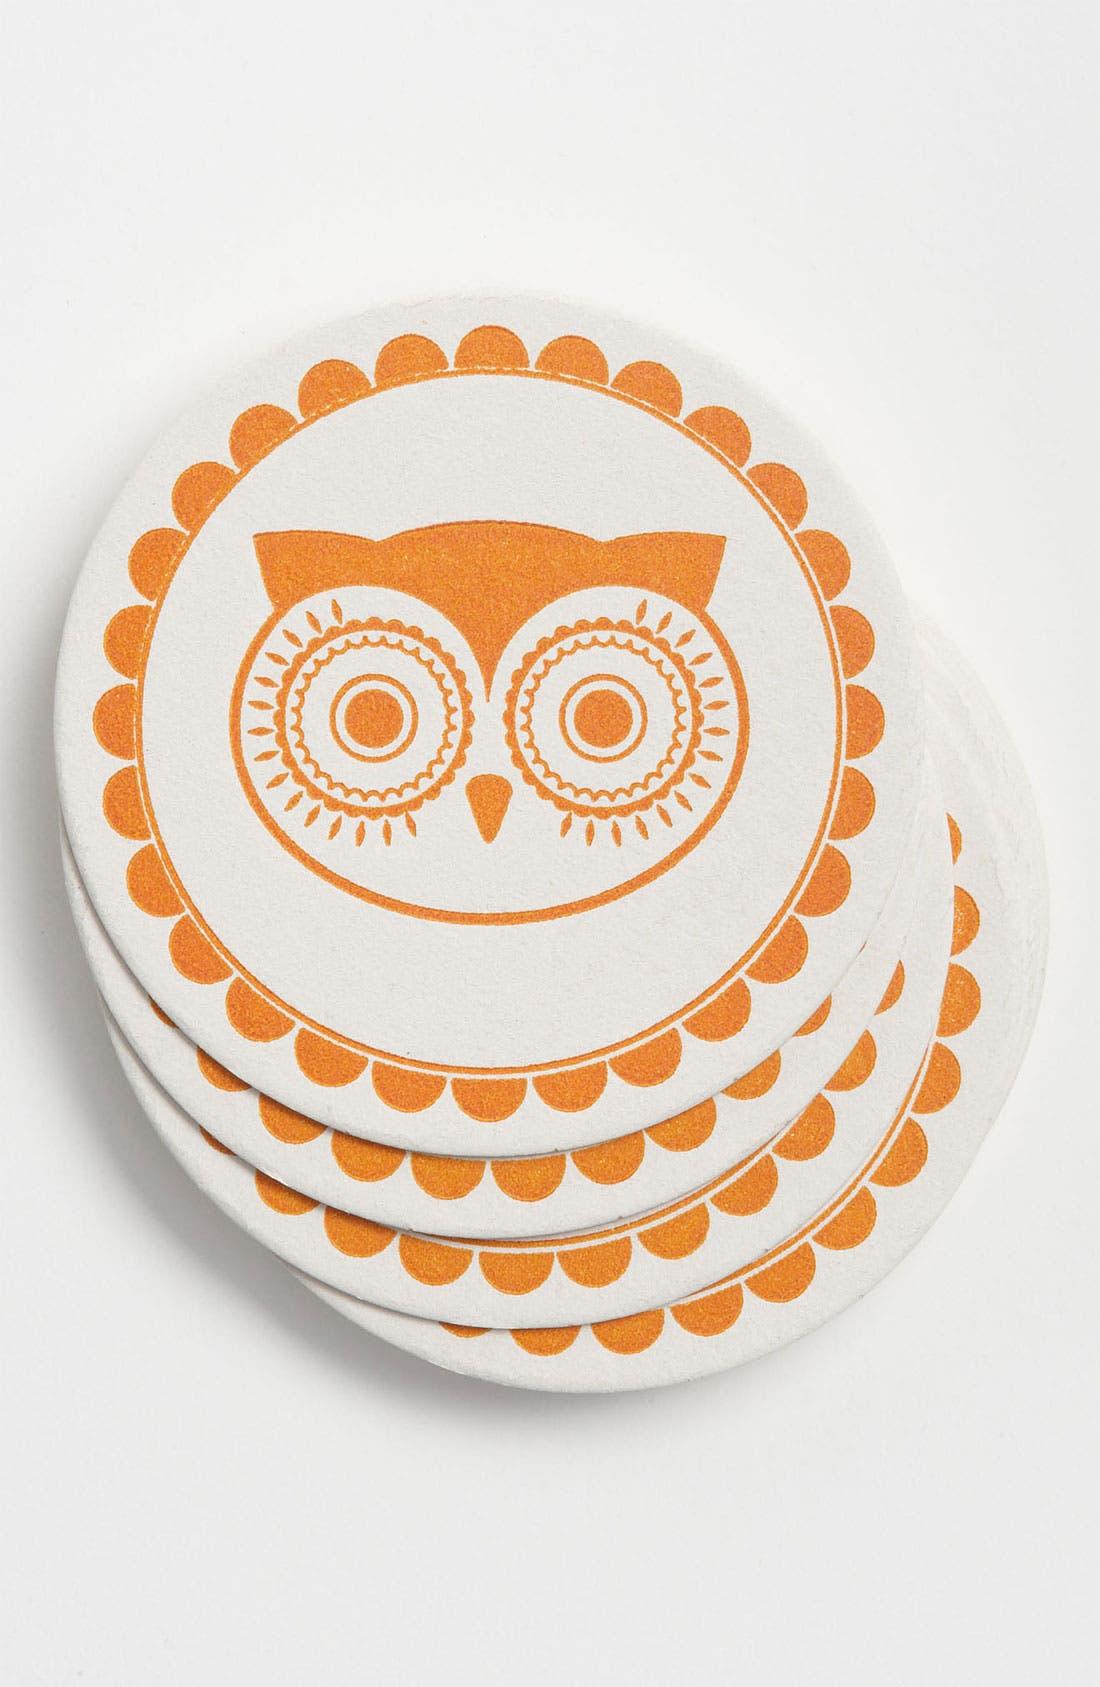 Alternate Image 1 Selected - 'Vintage Owl' Coasters (Set of 10)